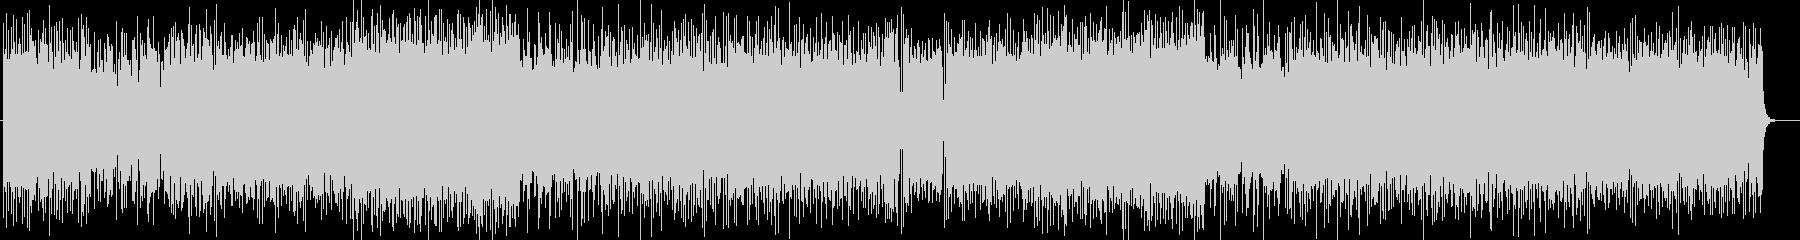 「METAL/DEATH」BGM238の未再生の波形